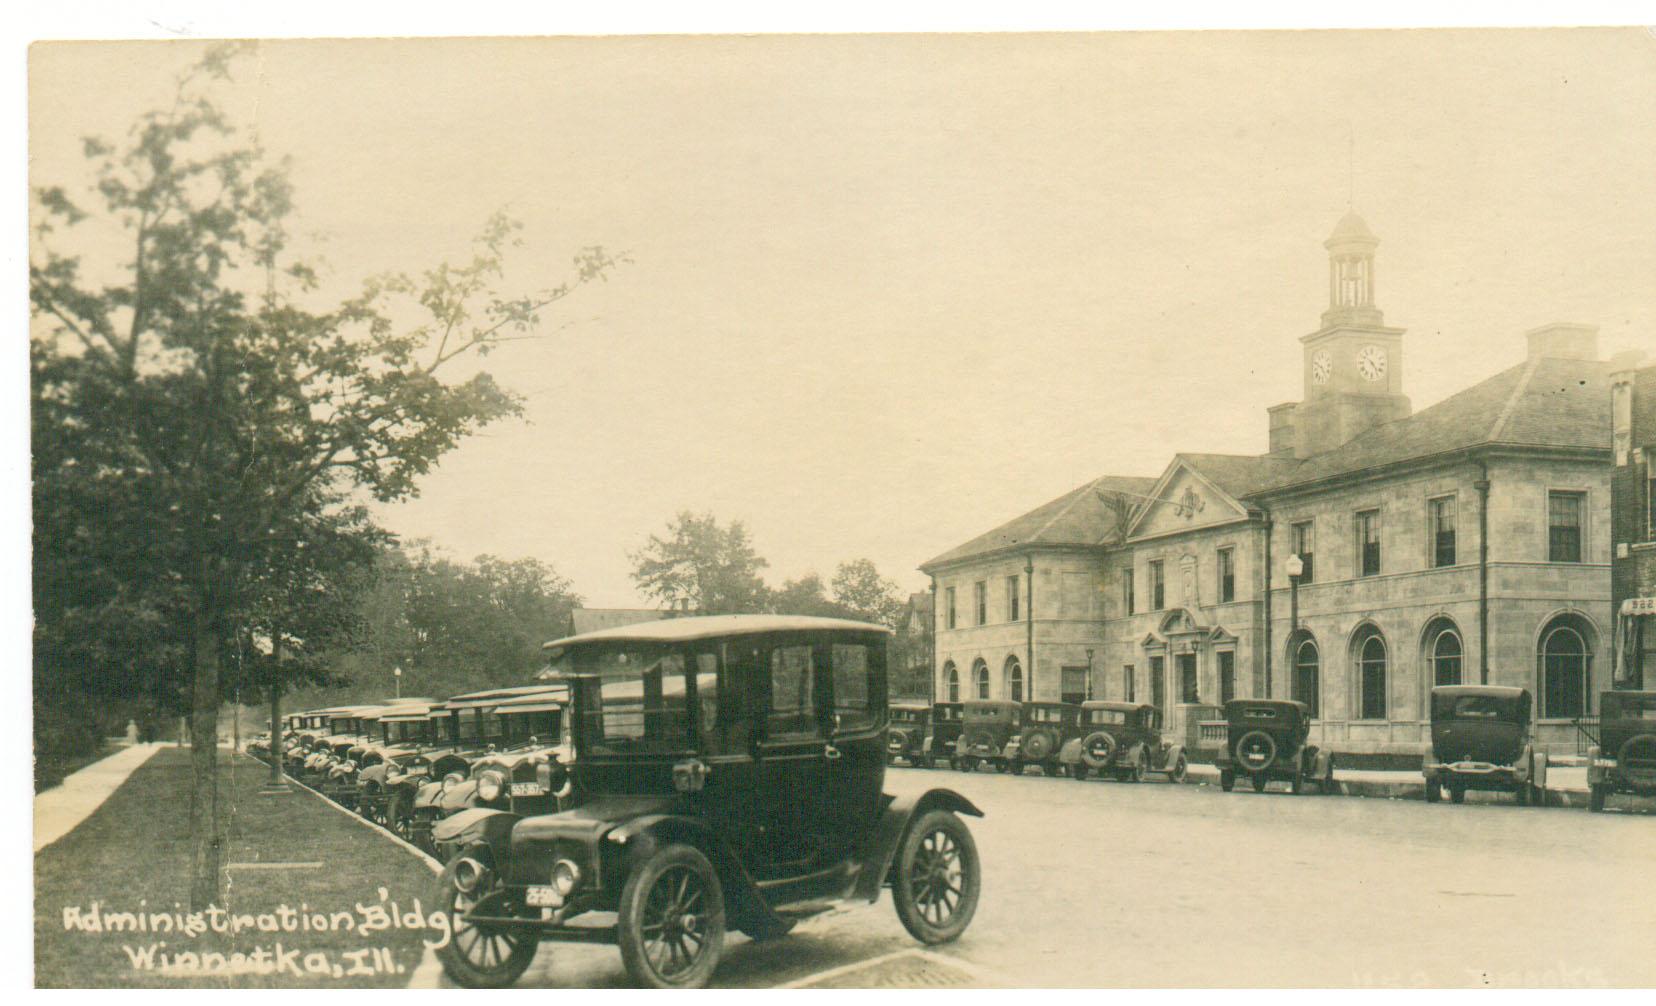 Village Hall circa 1935